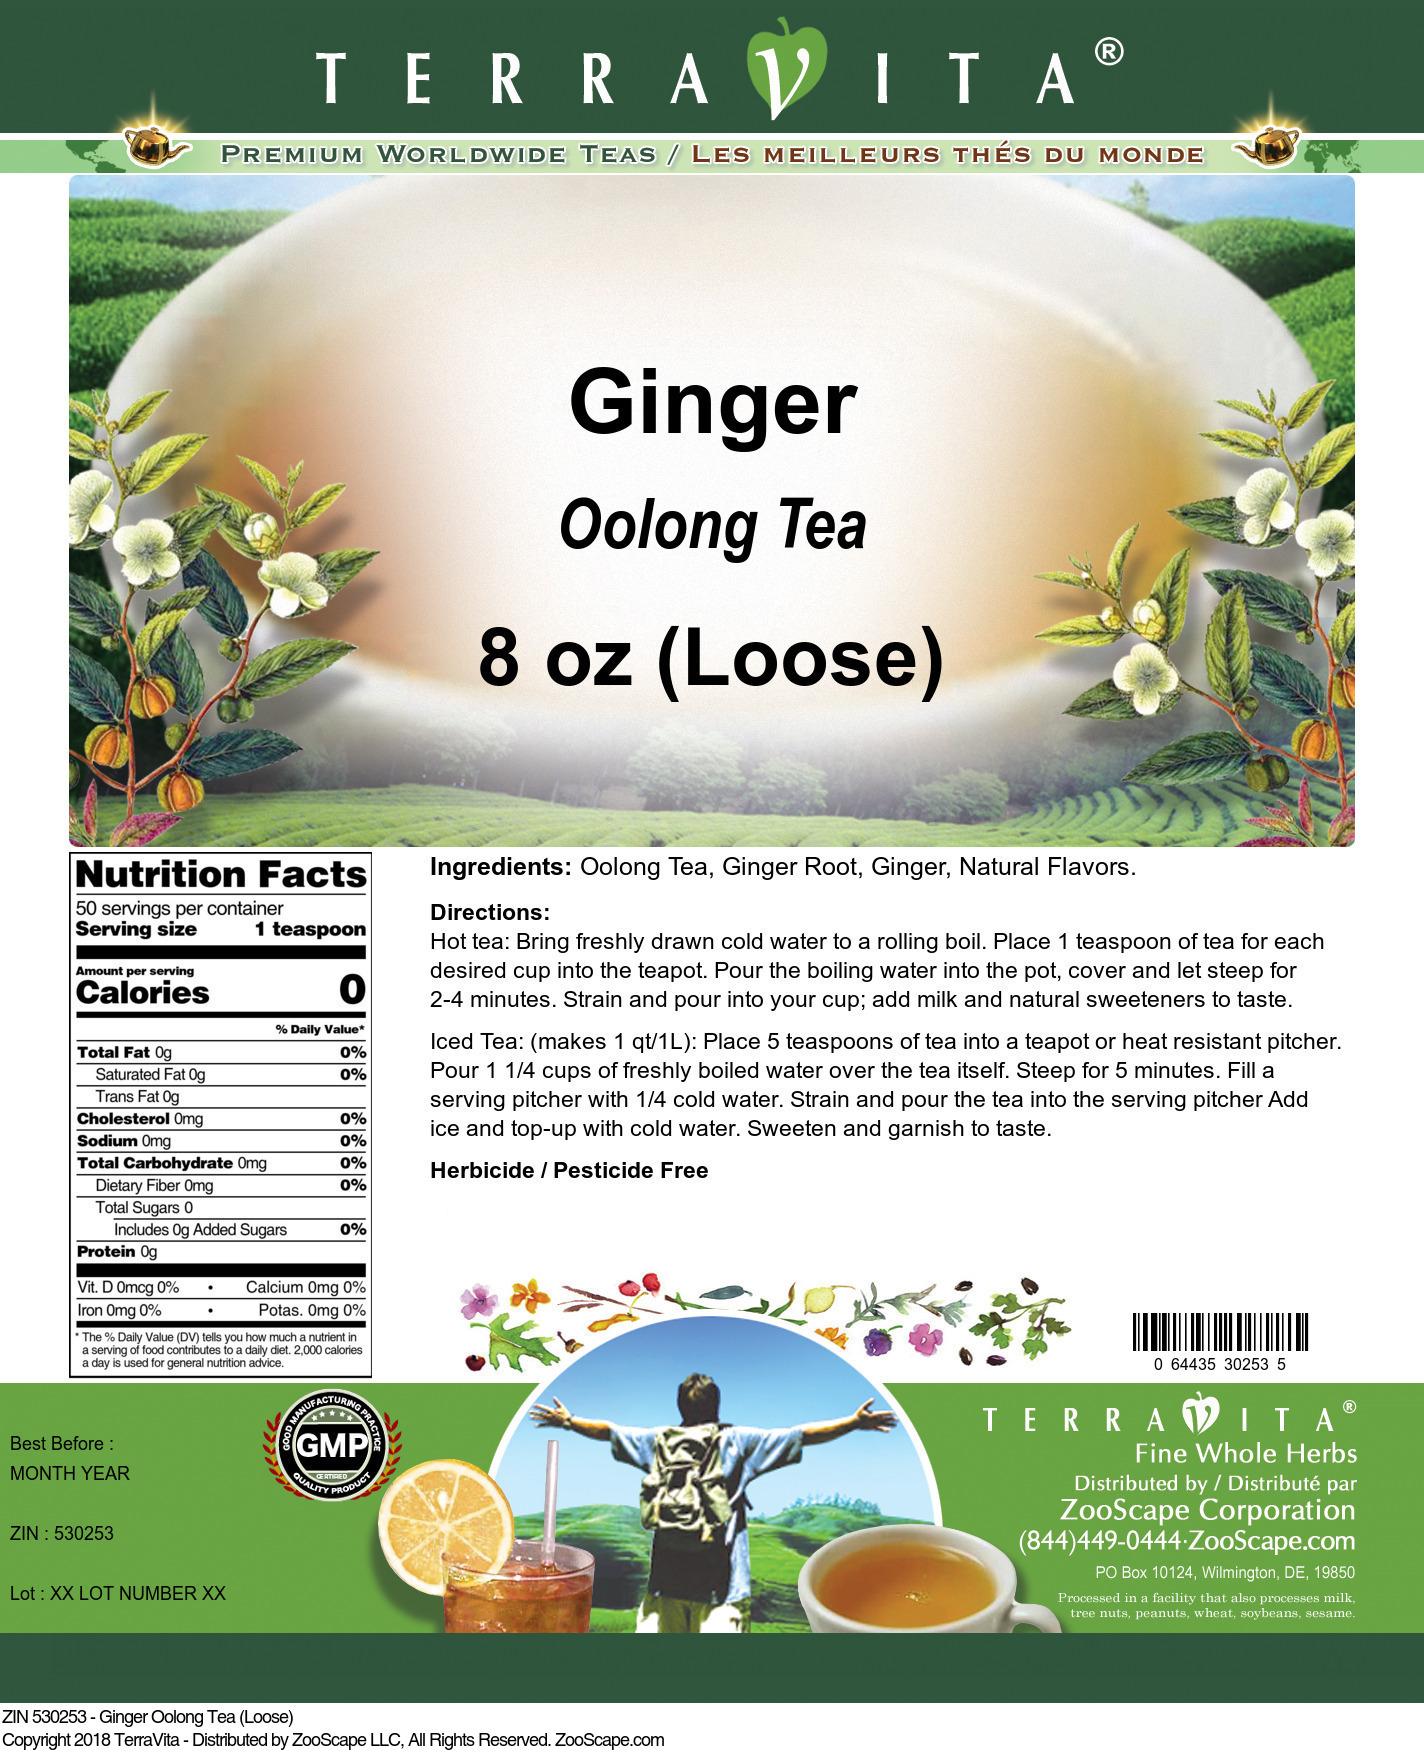 Ginger Oolong Tea (Loose)